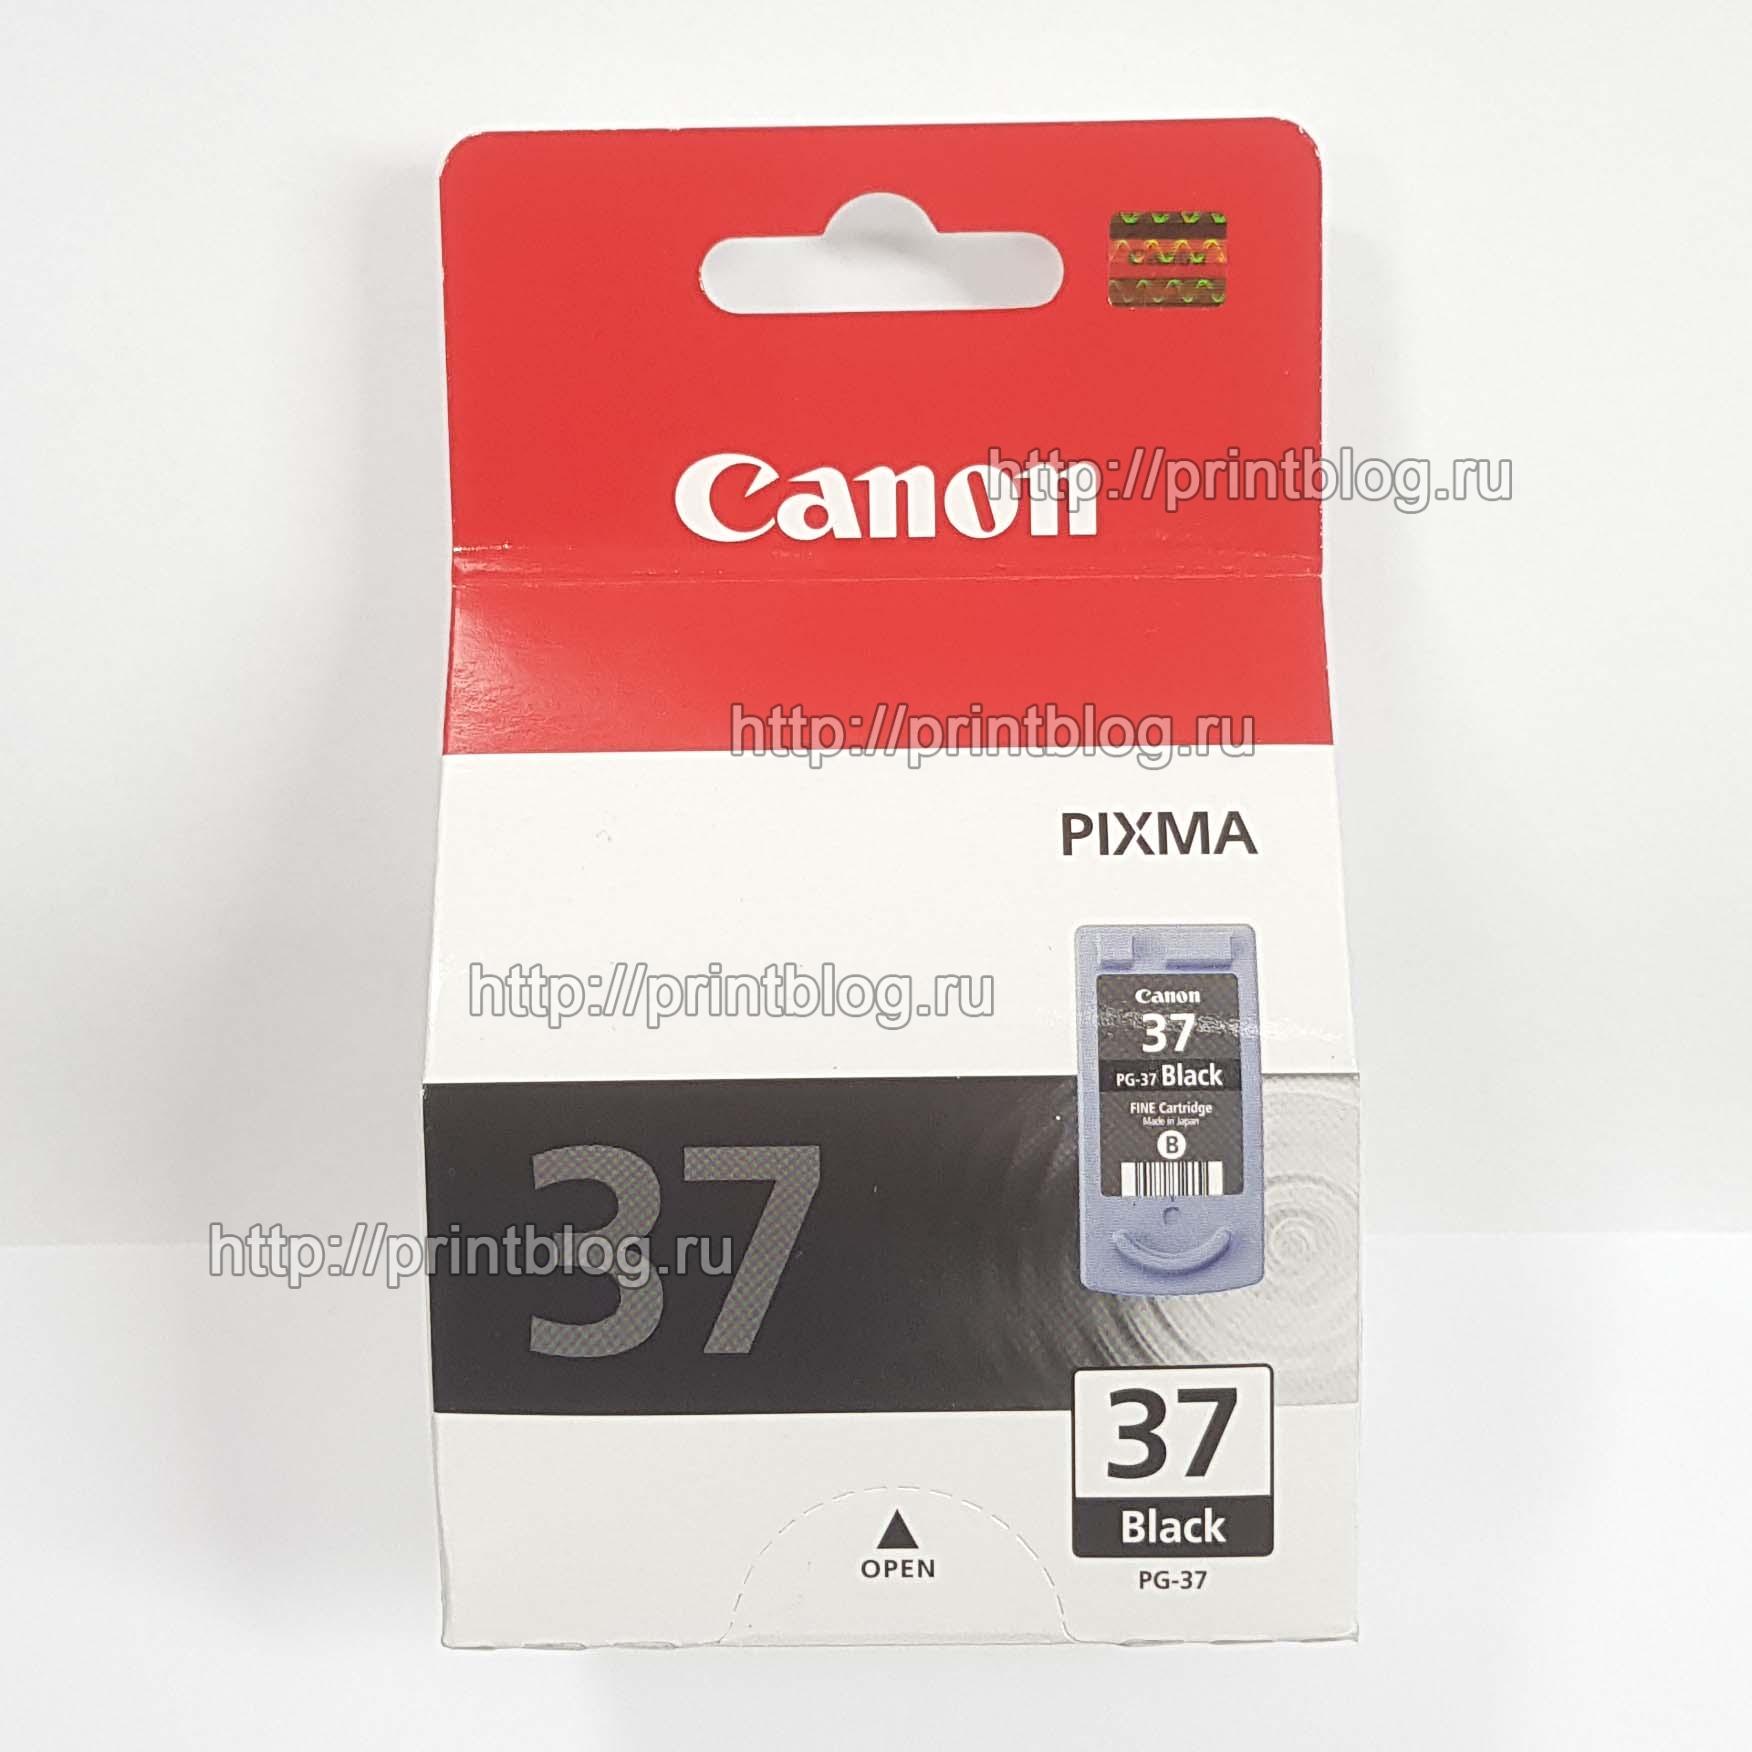 Картридж Canon PG-37 Black для Canon IP1900, MP190, MP210, MP220 и др. (2145B005)